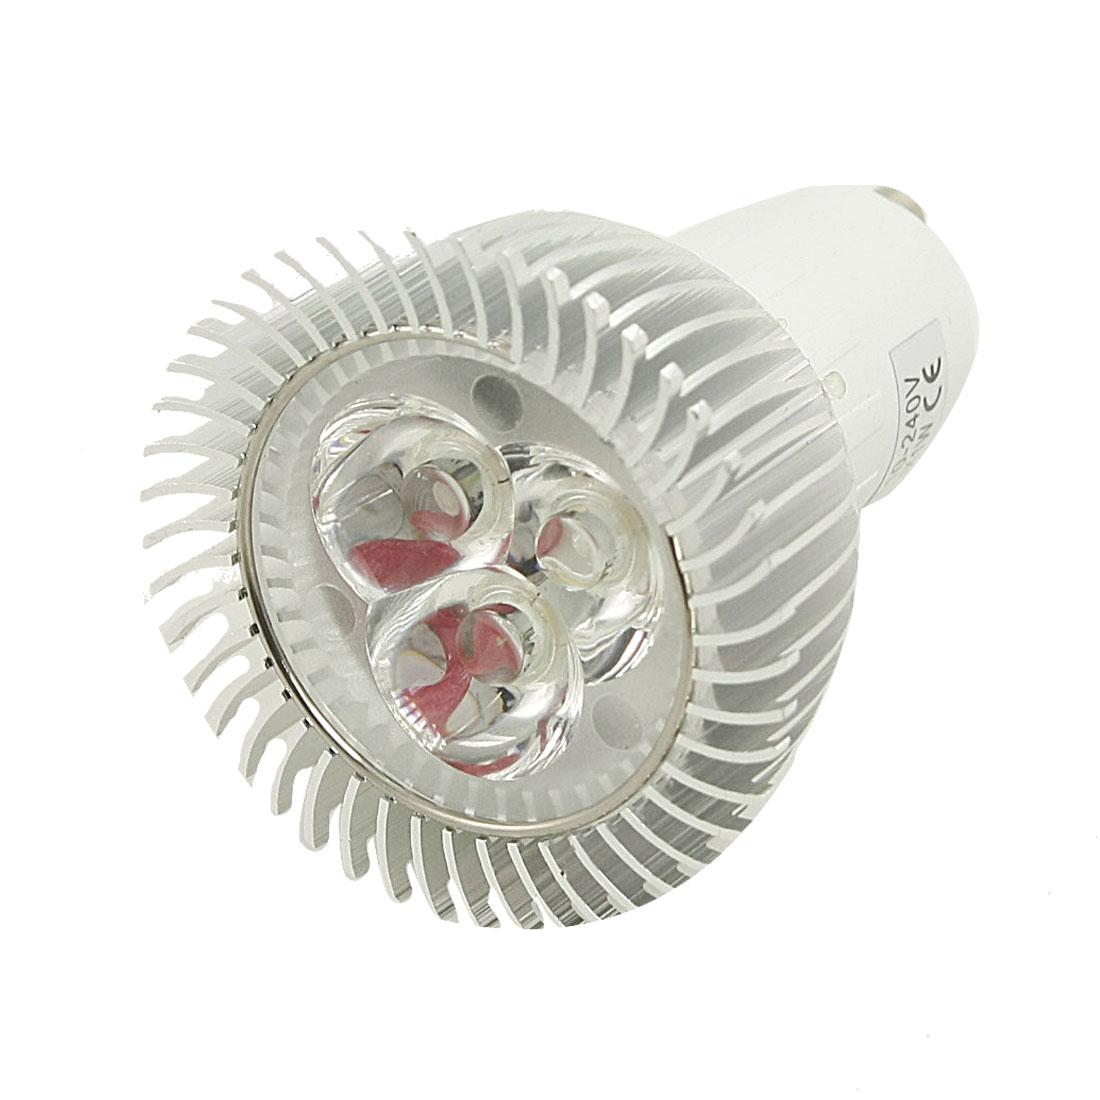 AC 110-240V Energy Saving 3x1W LED Warm White Spot Light Lamp GU10 3000K 3W